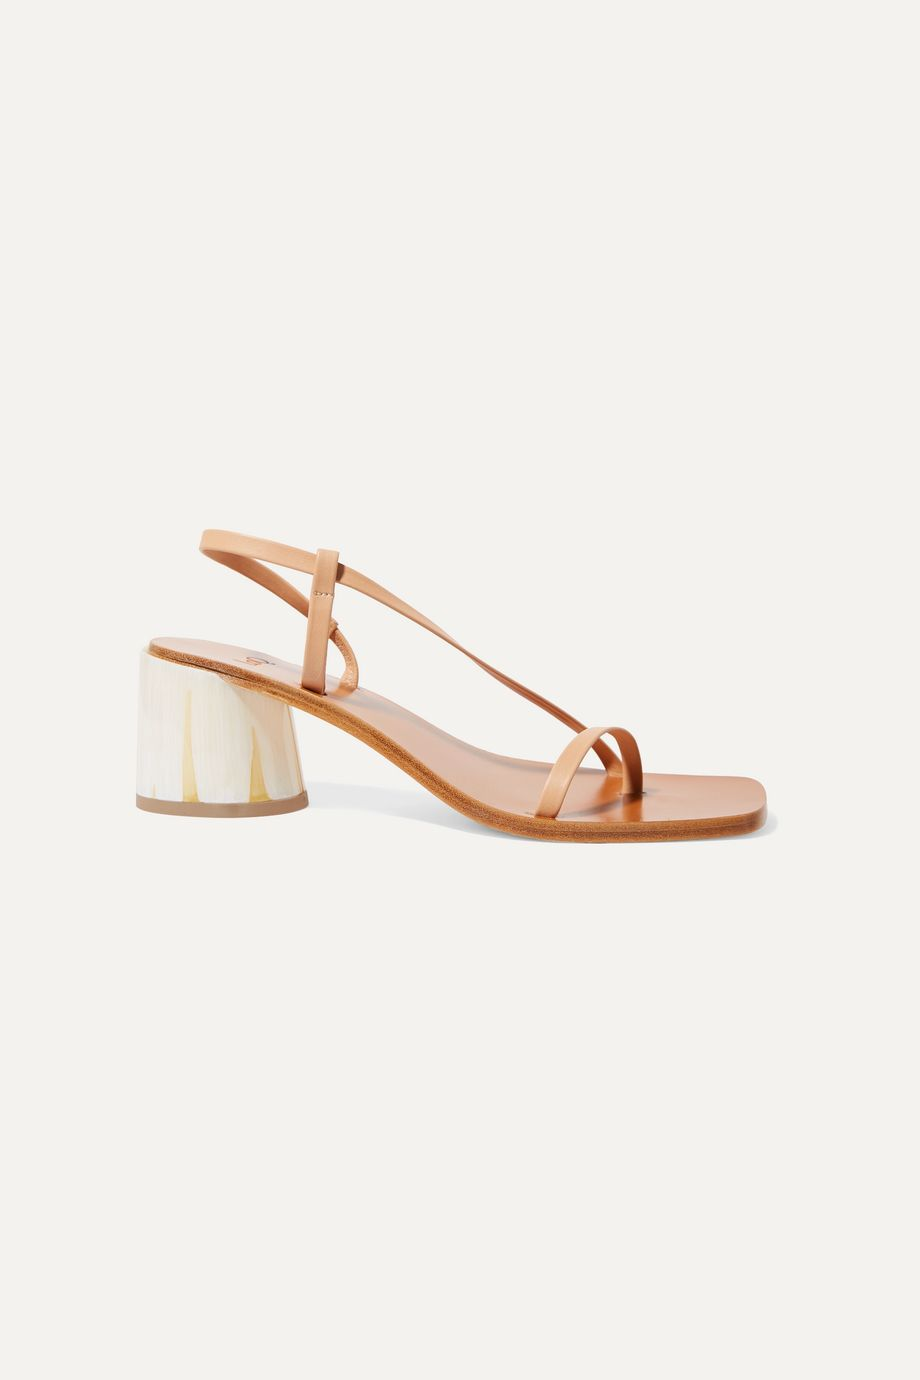 LOQ Isla leather sandals